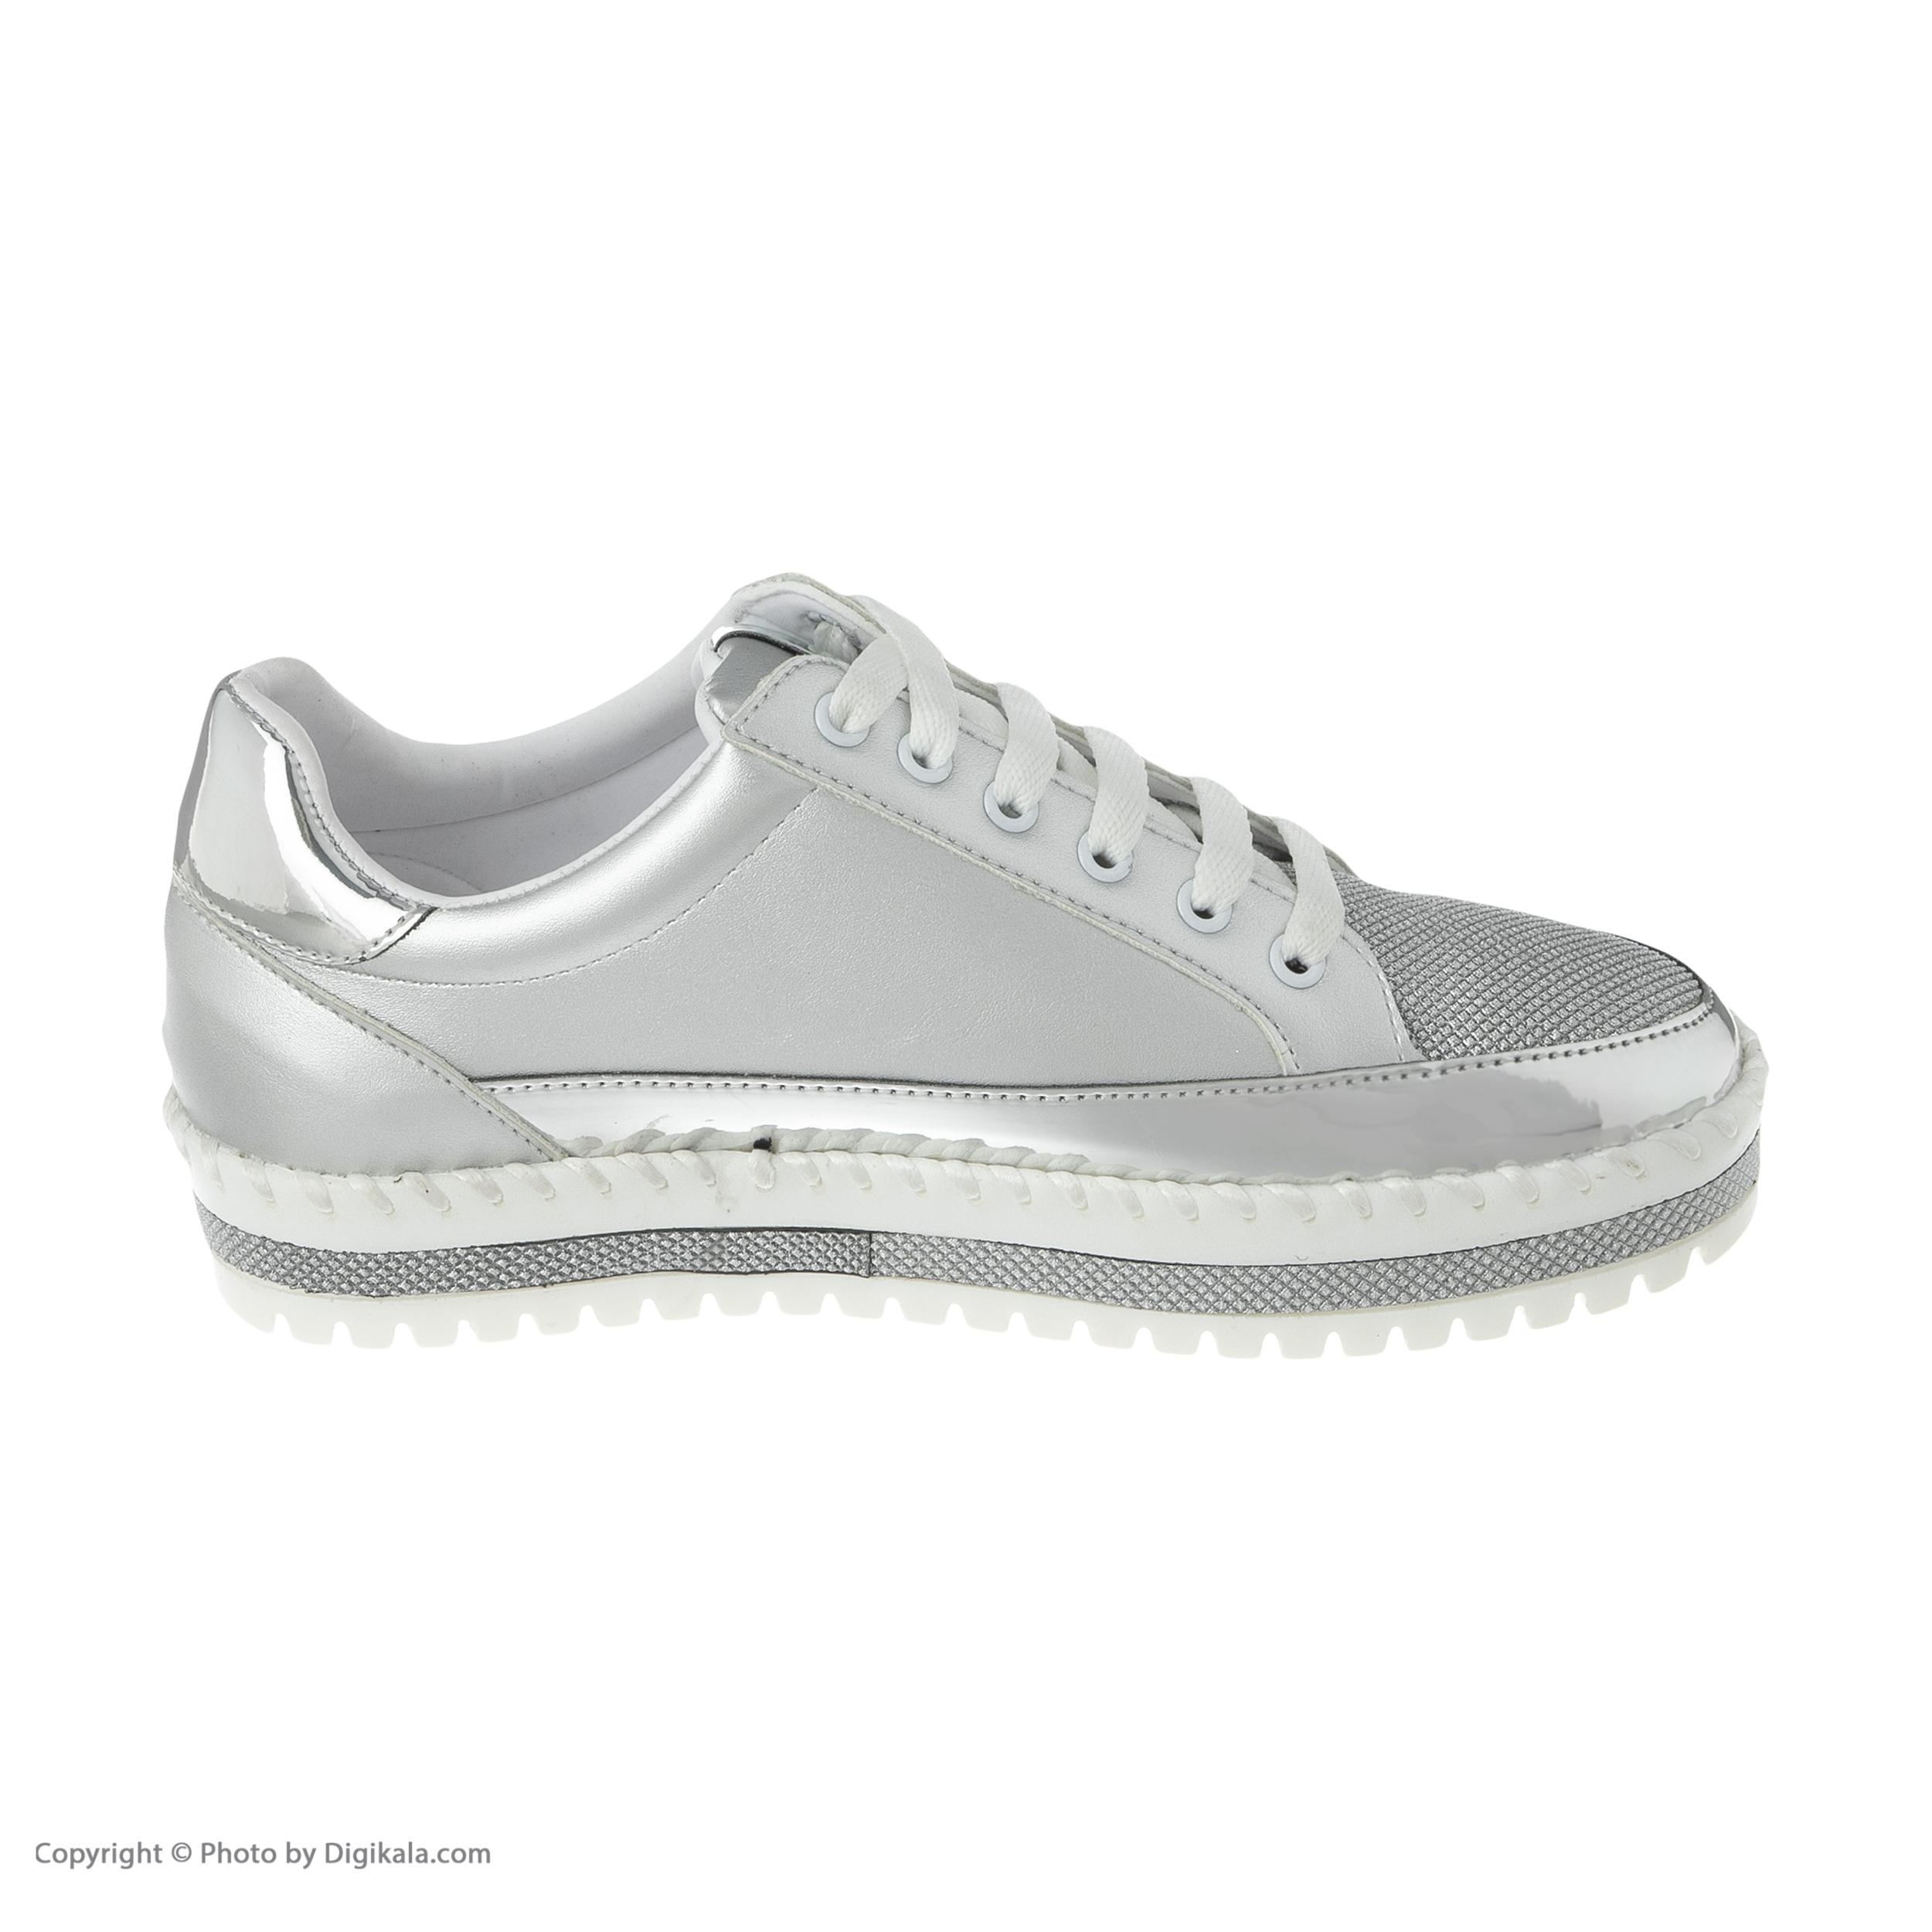 کفش روزمره زنانه ام تو مدل 1005-91